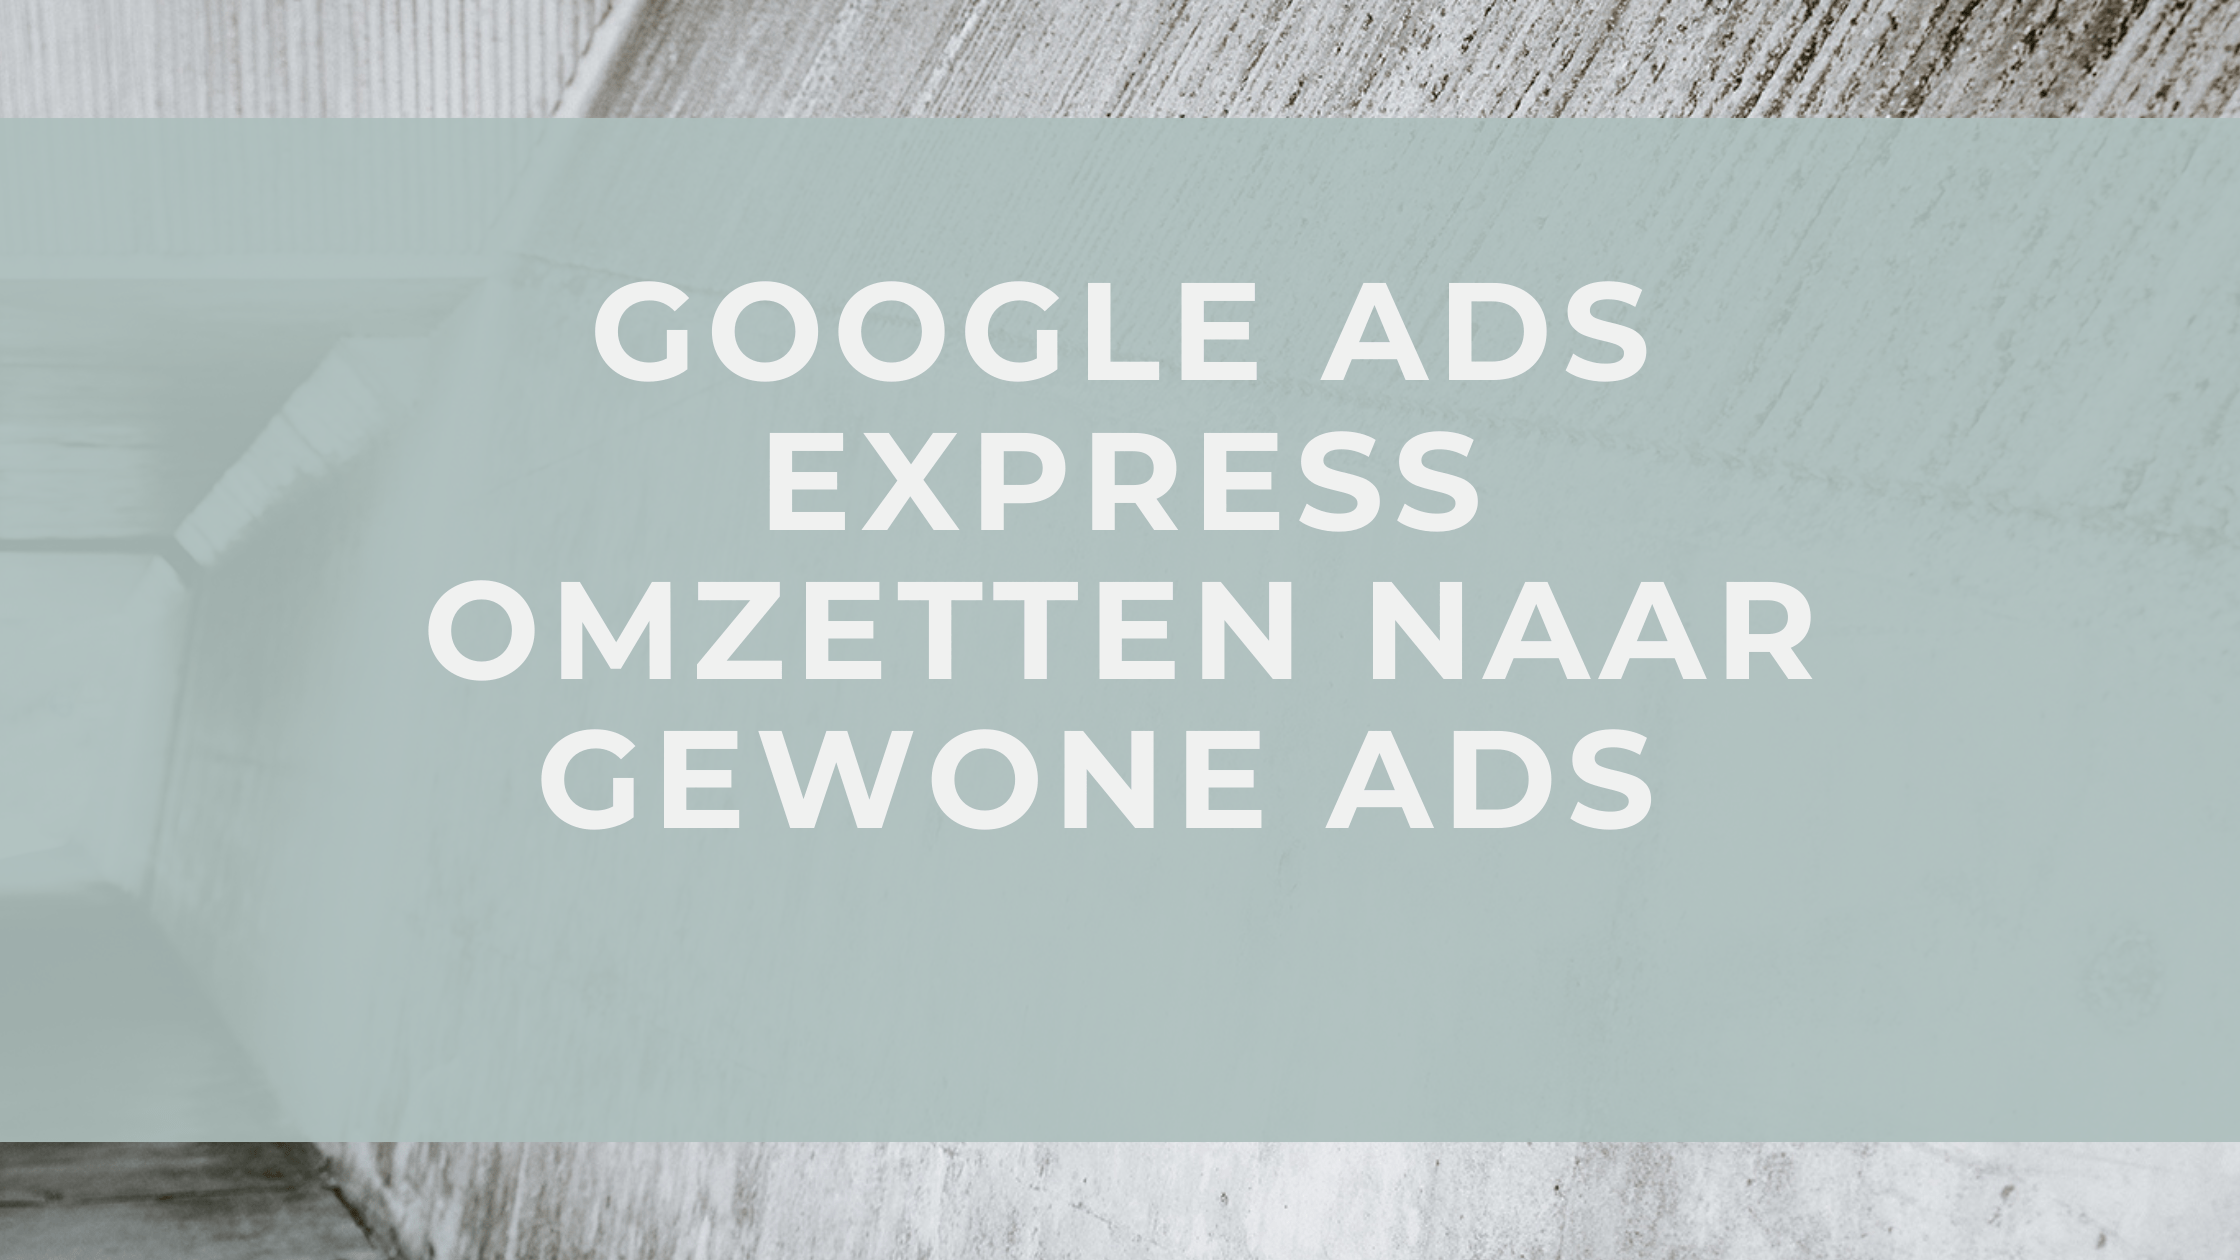 Google Ads AdWords express omzetten naar gewoon expert account